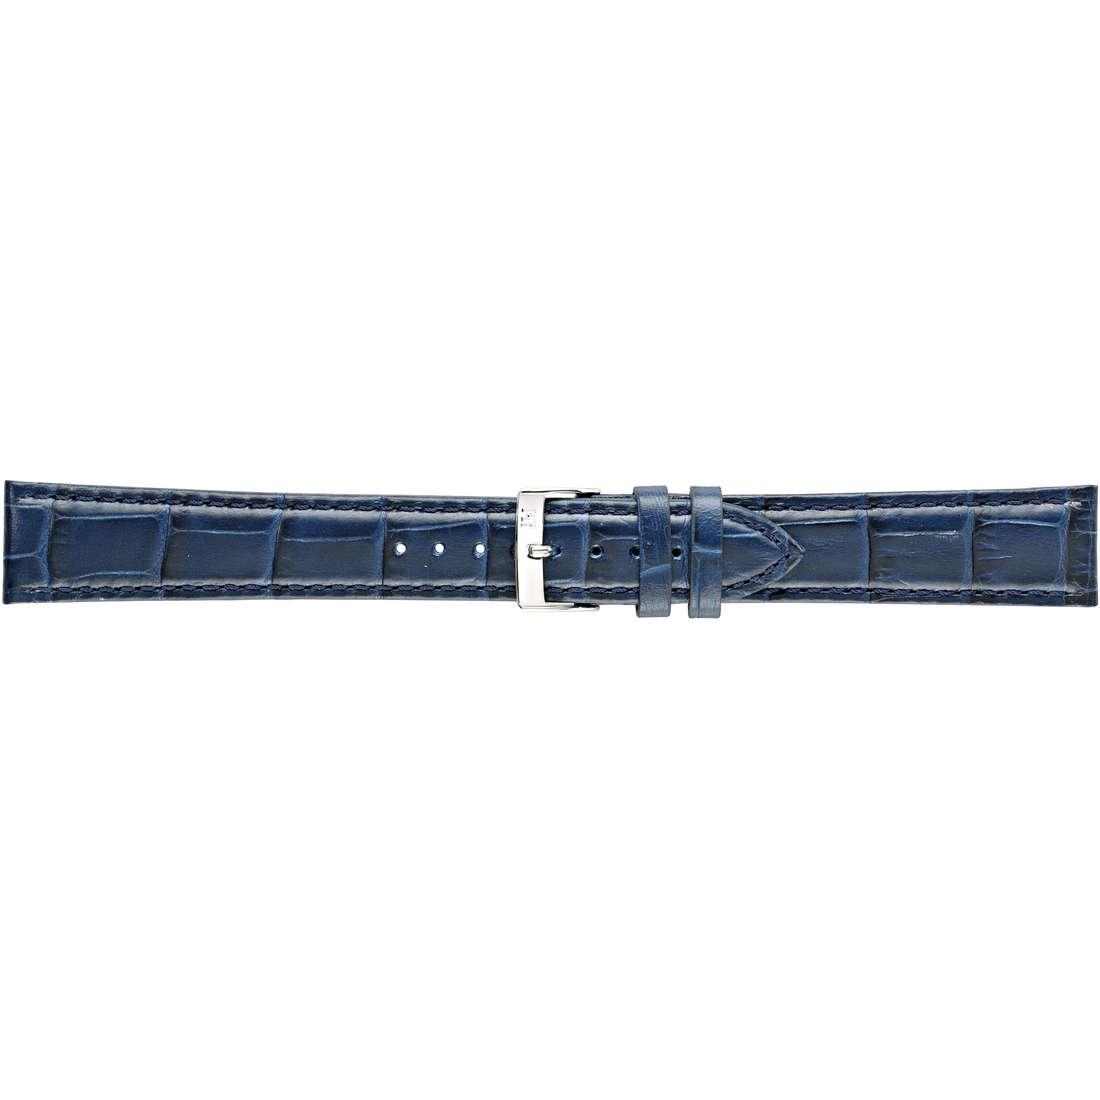 montre bande de montres unisex Morellato I Lunghi A01Y2269480061CR22